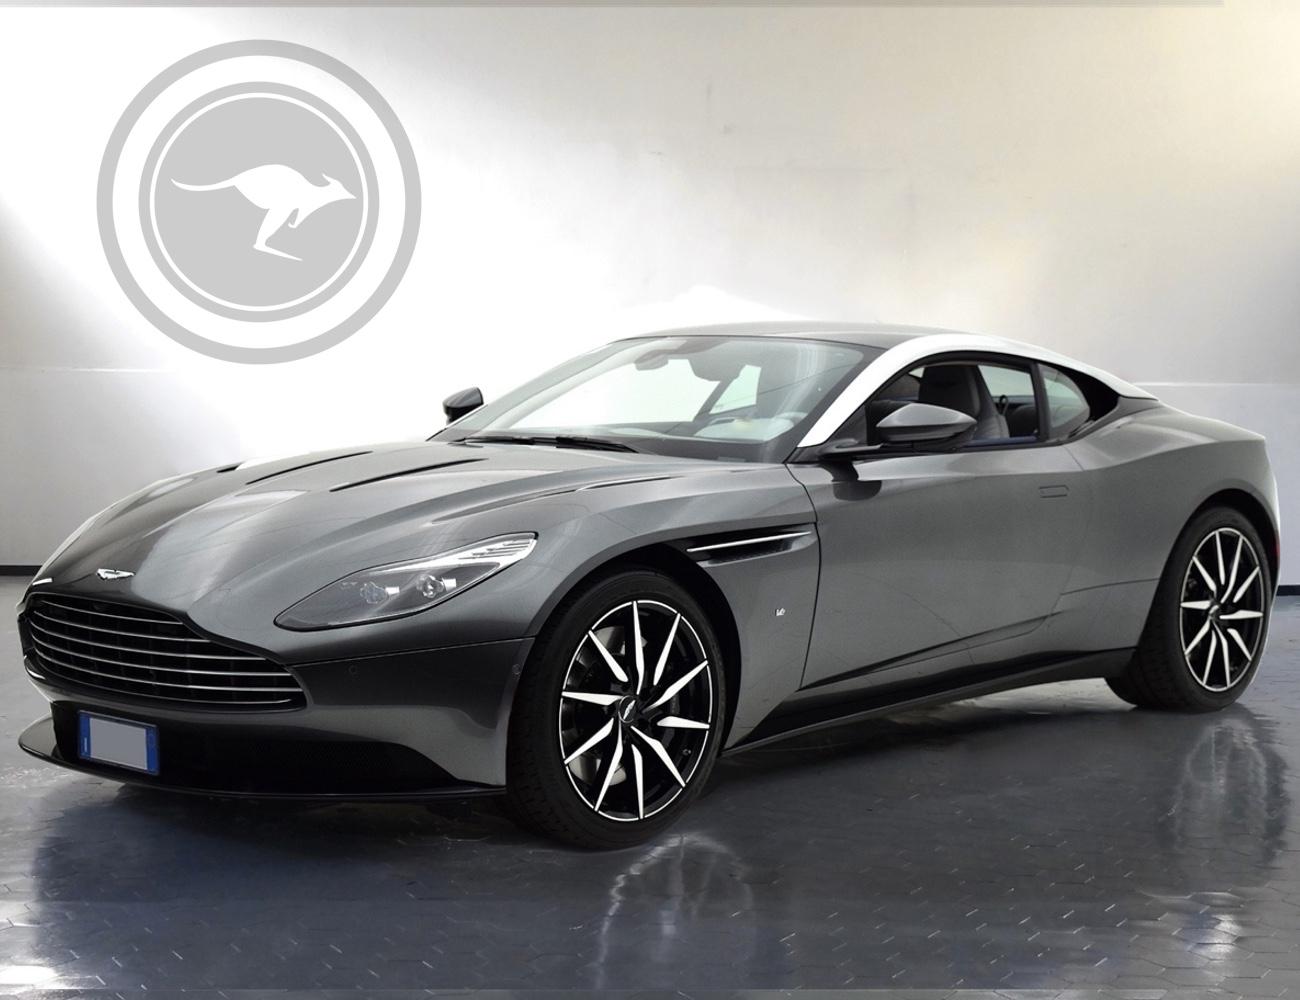 Rent Aston Martin DB - Aston martin vanquish rental